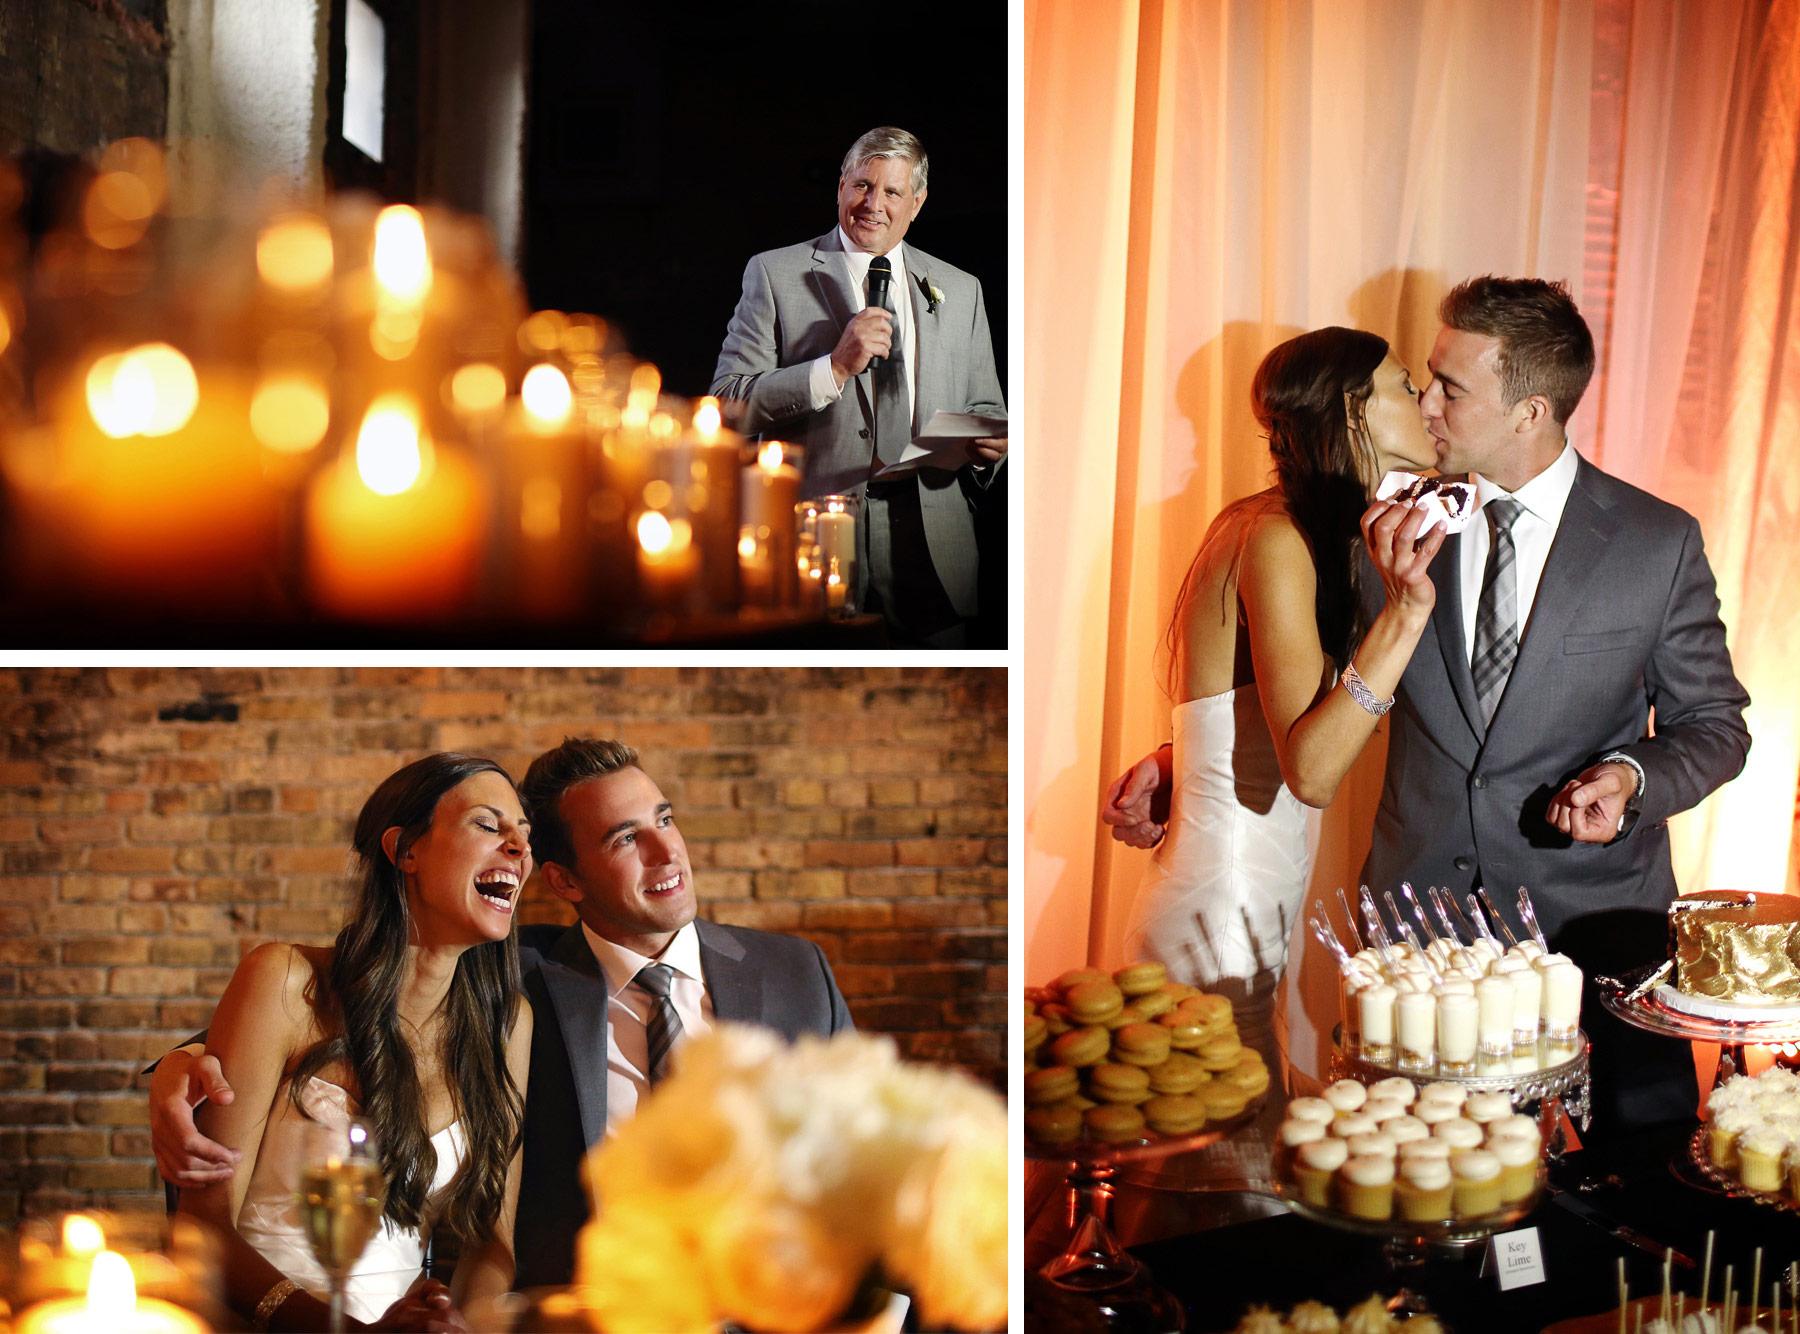 17-Minneapolis-Minnesota-Wedding-Photography-by-Vick-Photography-Aria-Reception-Katie-&-Joe.jpg